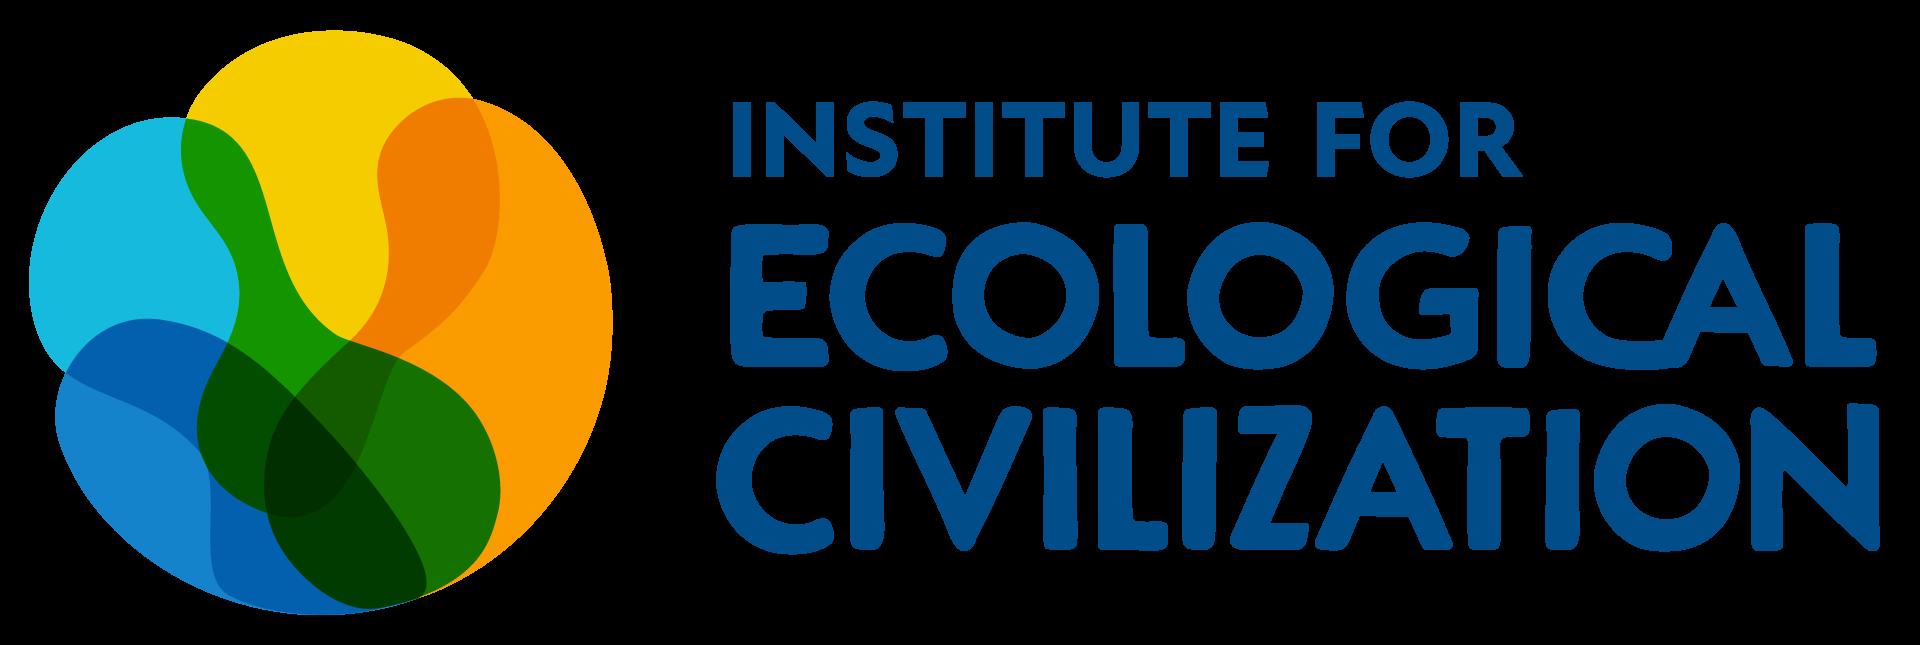 Institute for Ecological Civilization